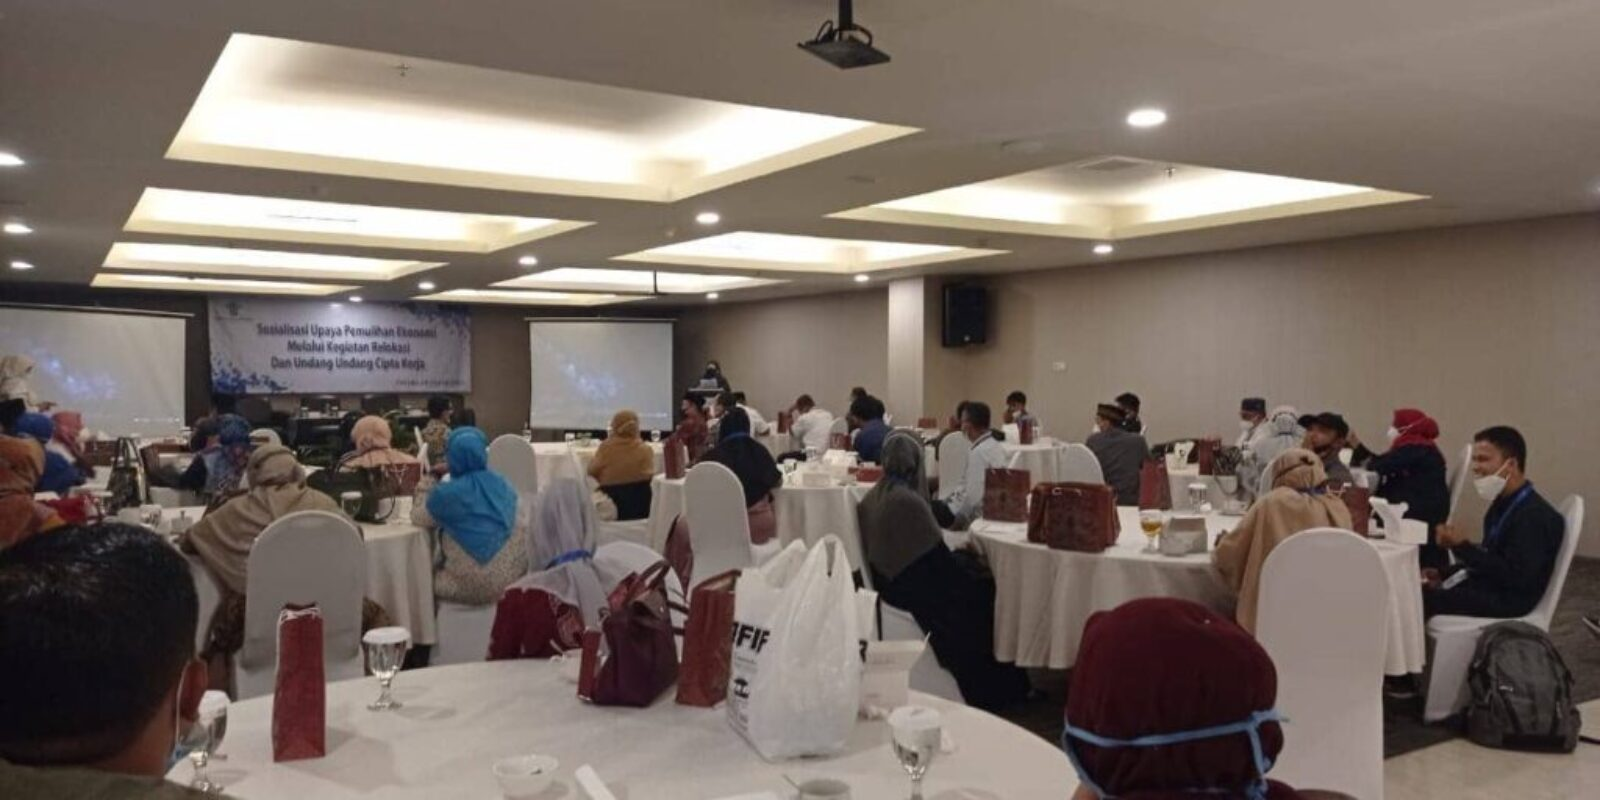 Di Sumbar, Nevi Zuairina Turut Sosialisasi Upaya Pemulihan Ekonomi Bersama Mitra Kerja Komisi VI